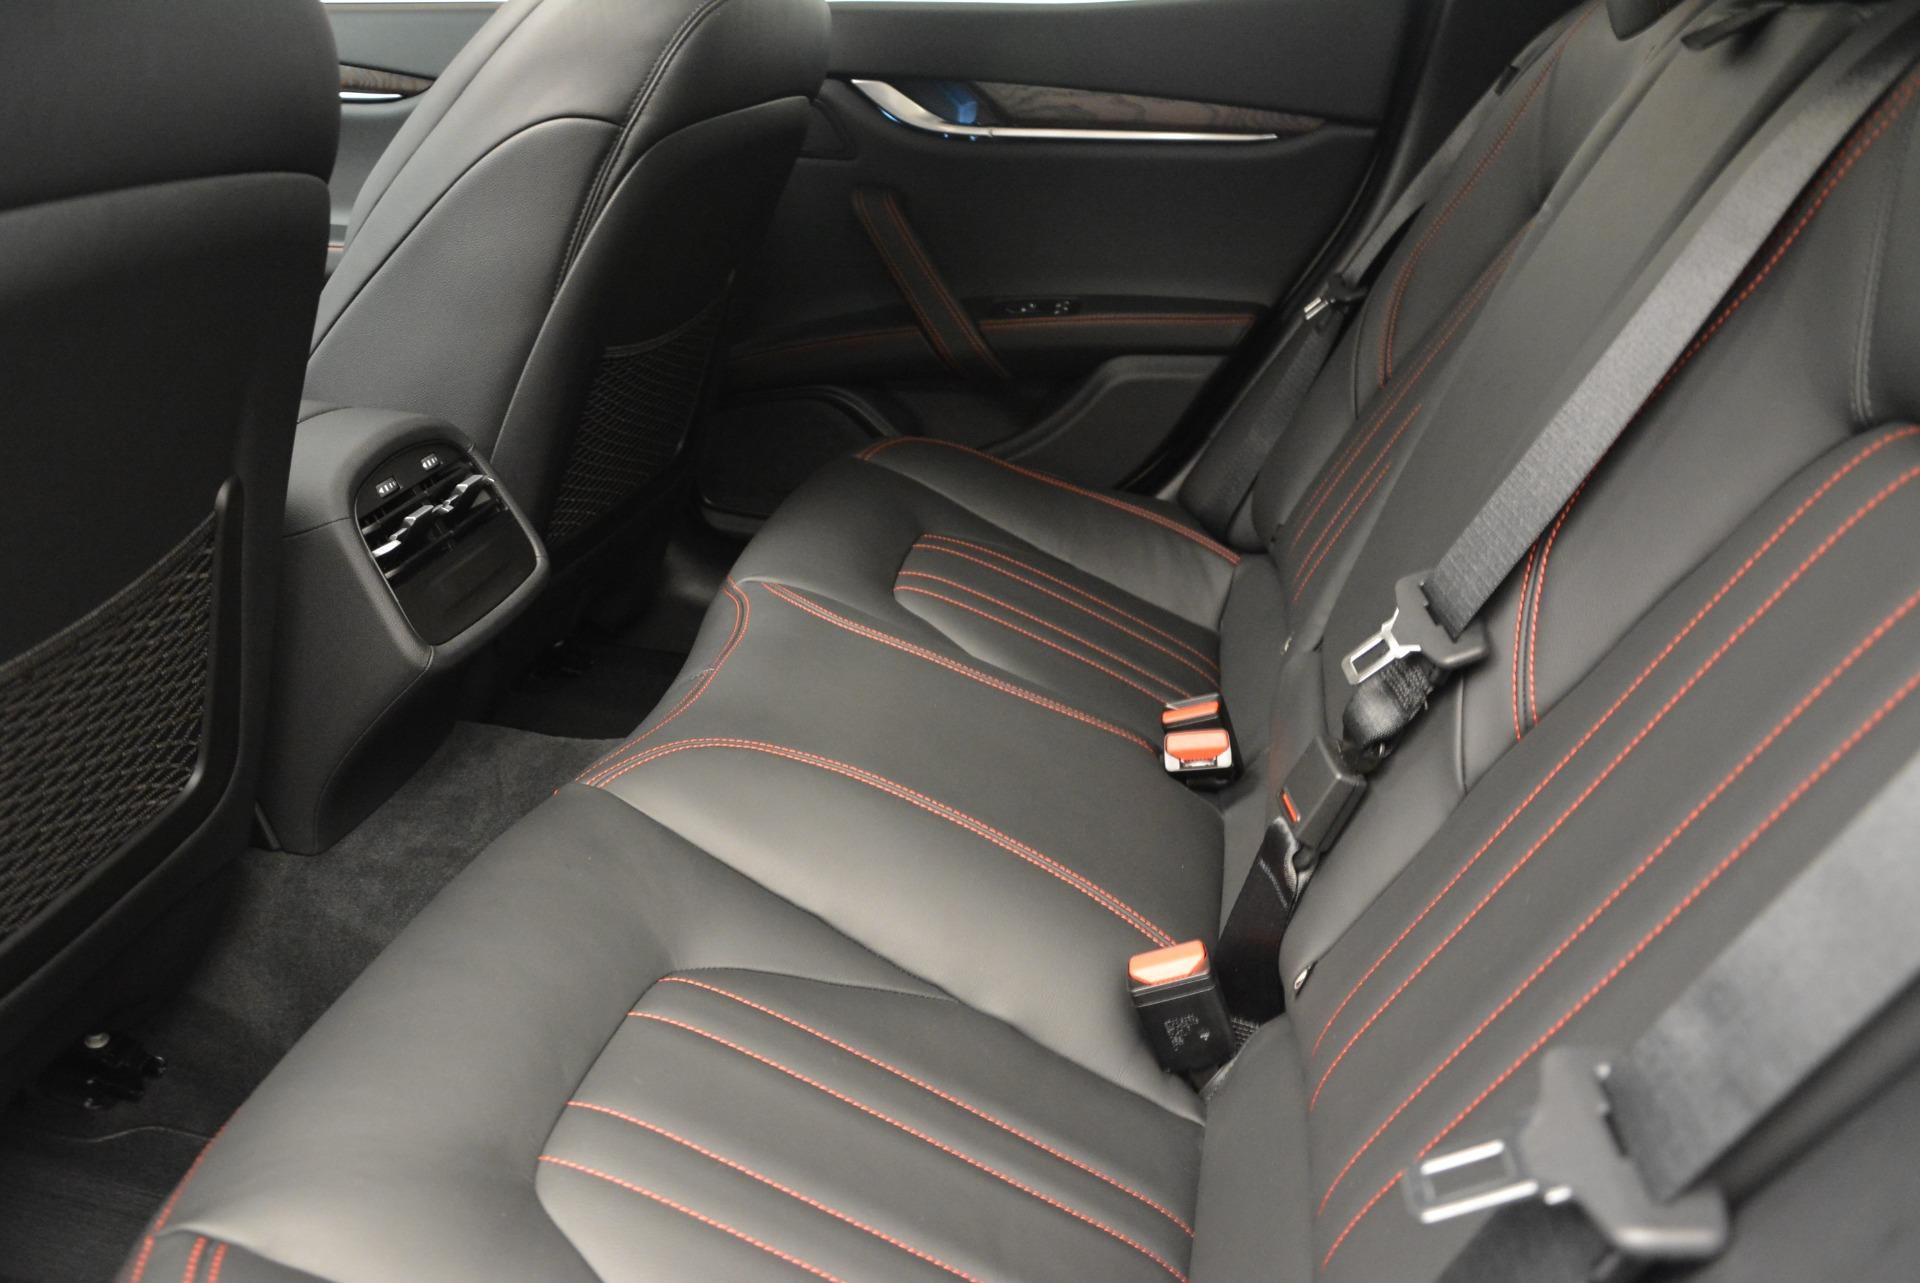 Used 2016 Maserati Ghibli S Q4  EX-LOANER For Sale In Greenwich, CT. Alfa Romeo of Greenwich, W252 669_p17